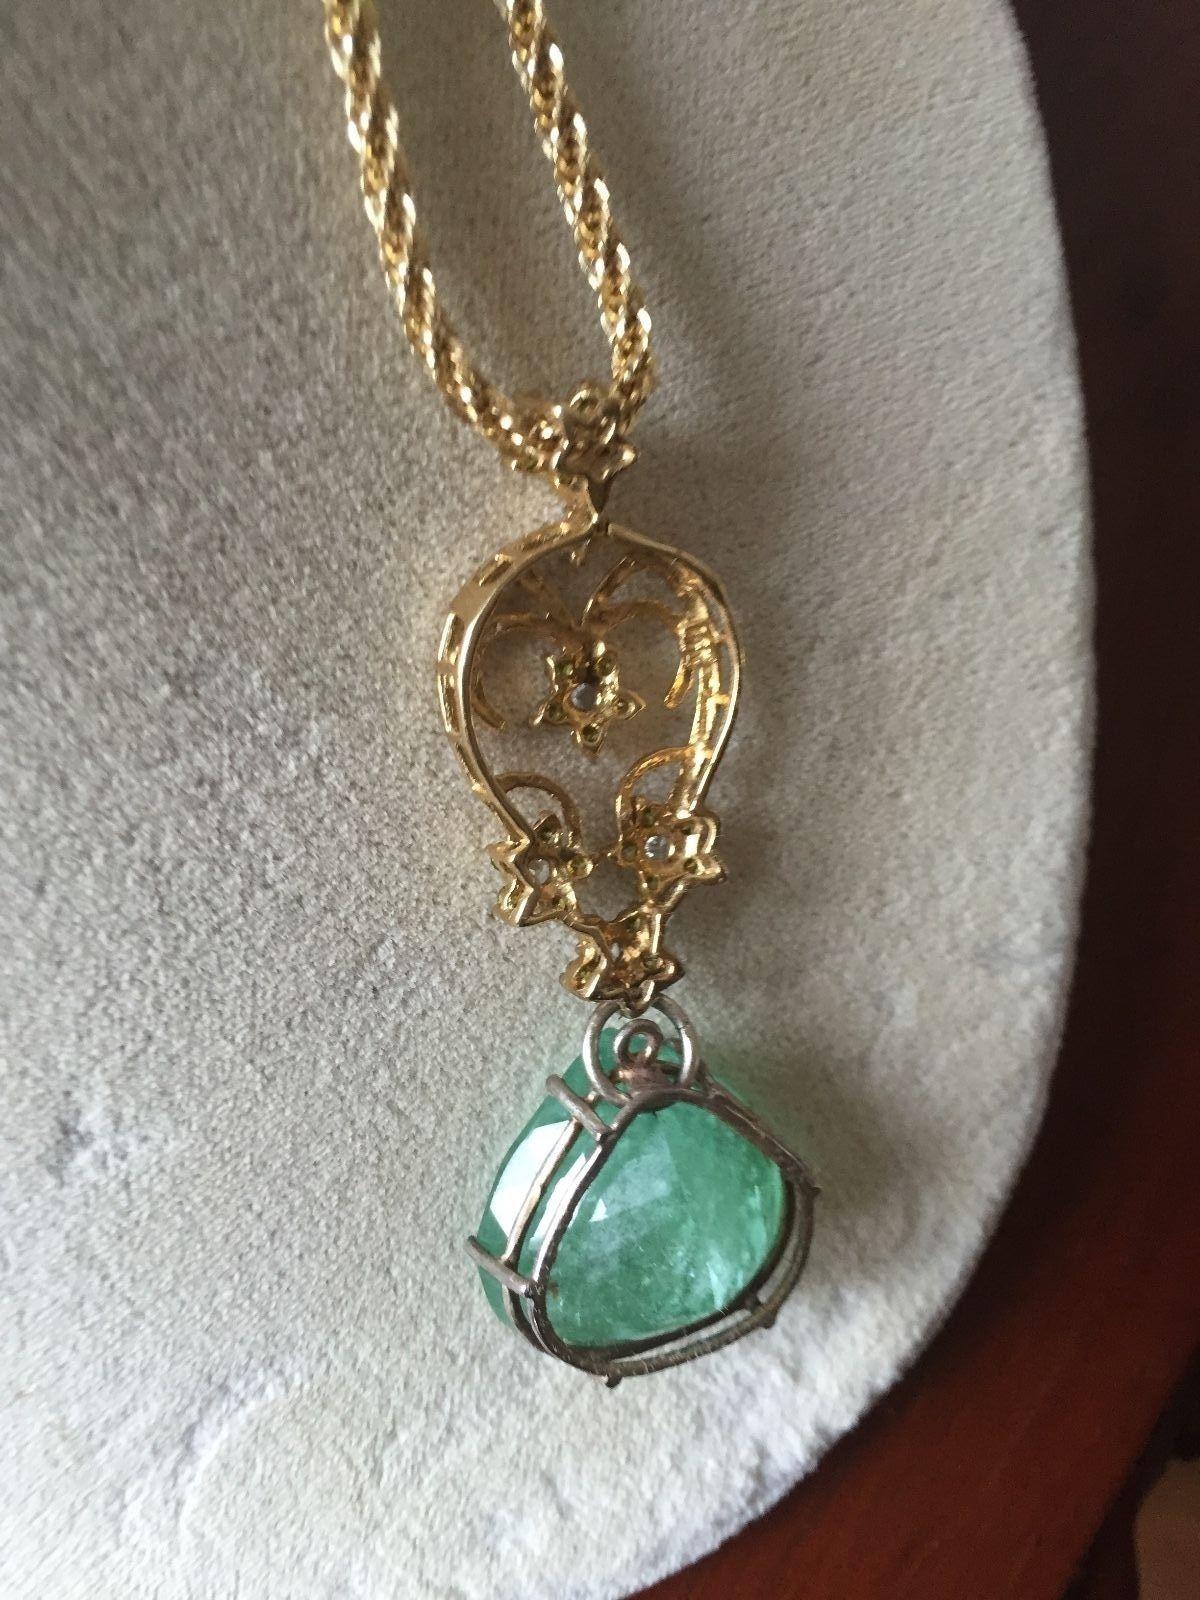 Huge Estate Natural 33.4 carat Canary Yellow Diamonds & Emerald pendant necklace